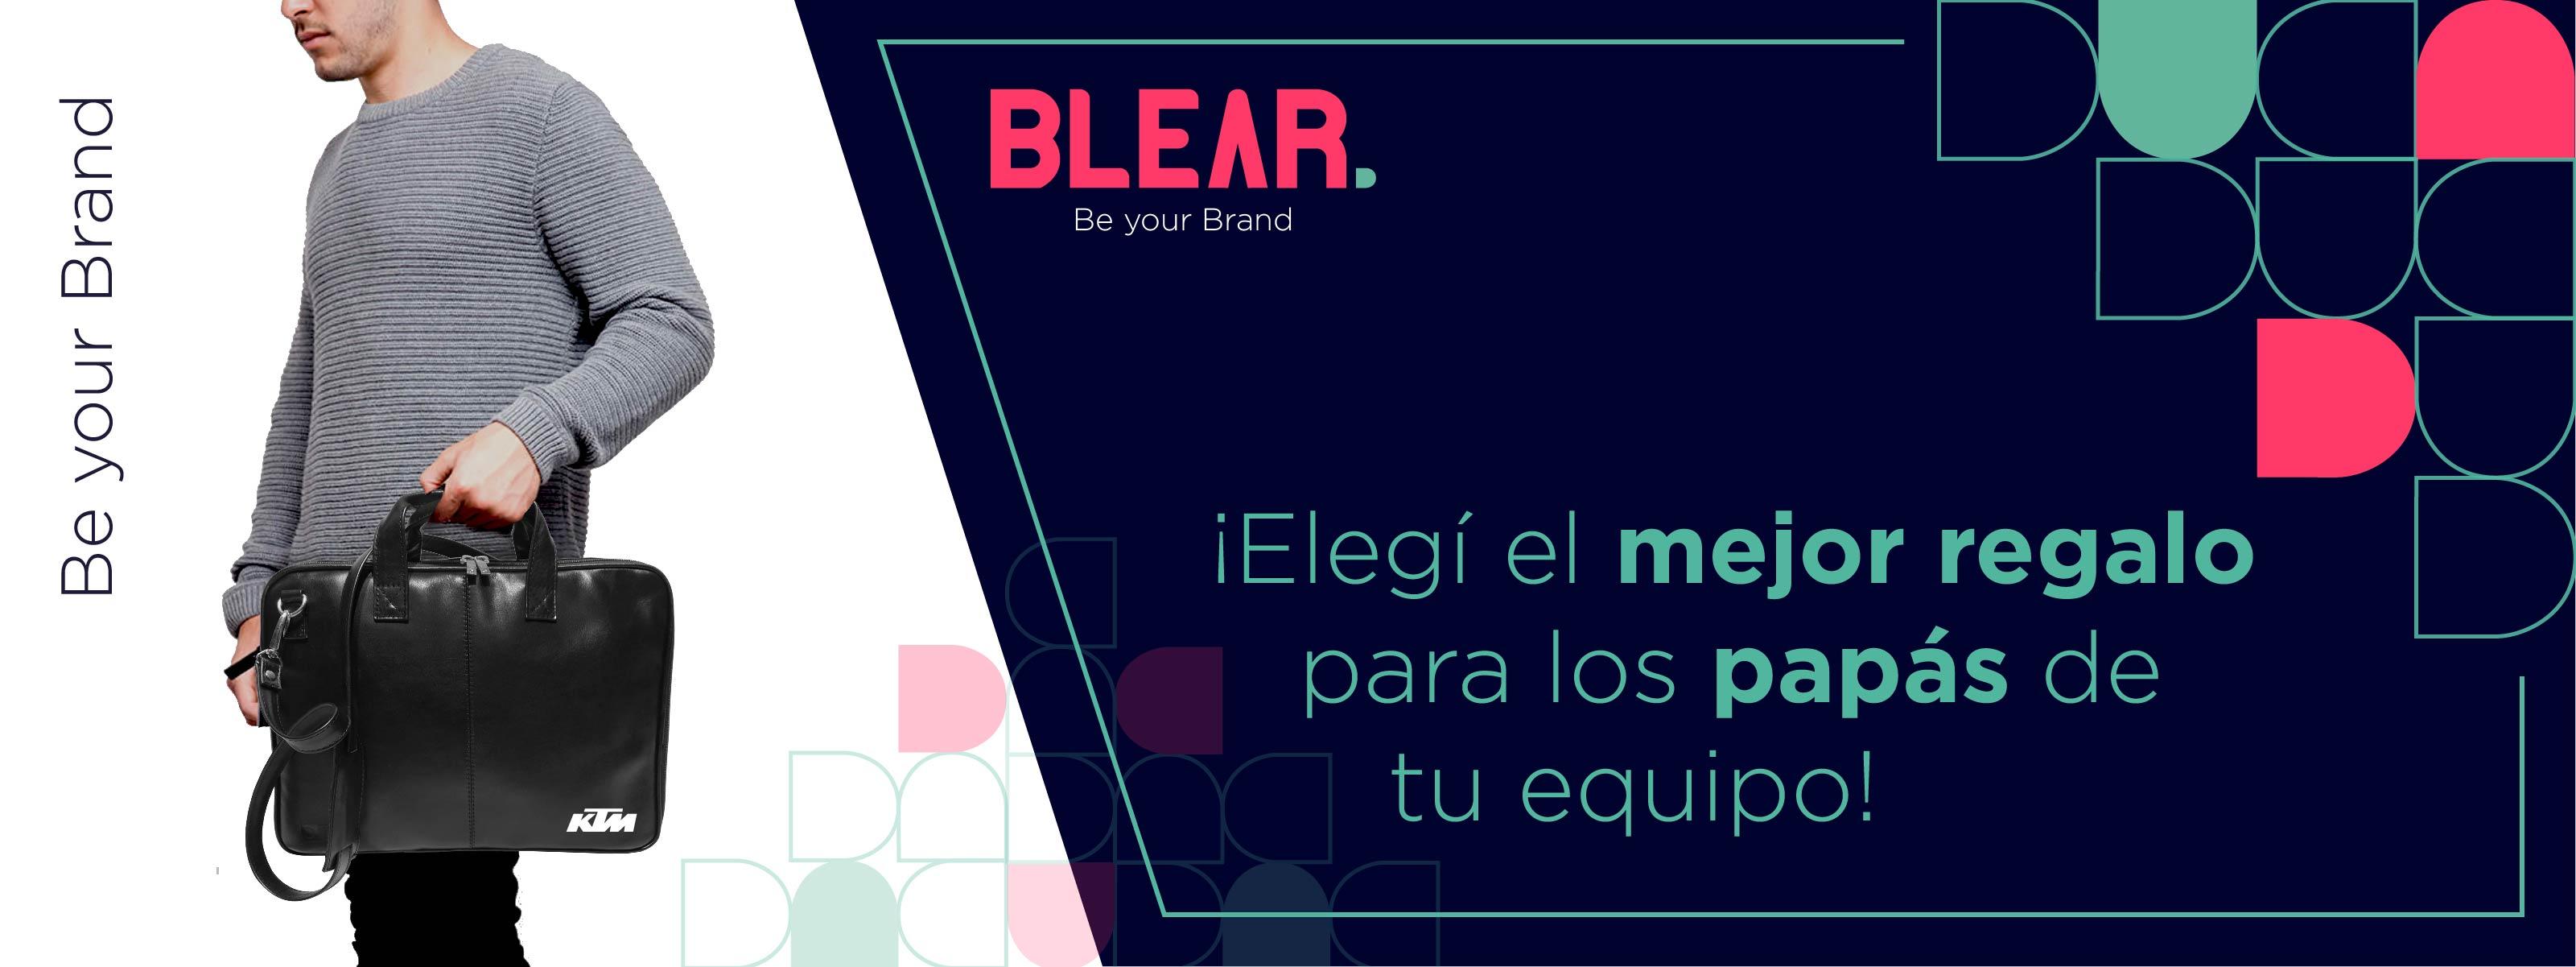 Blear.